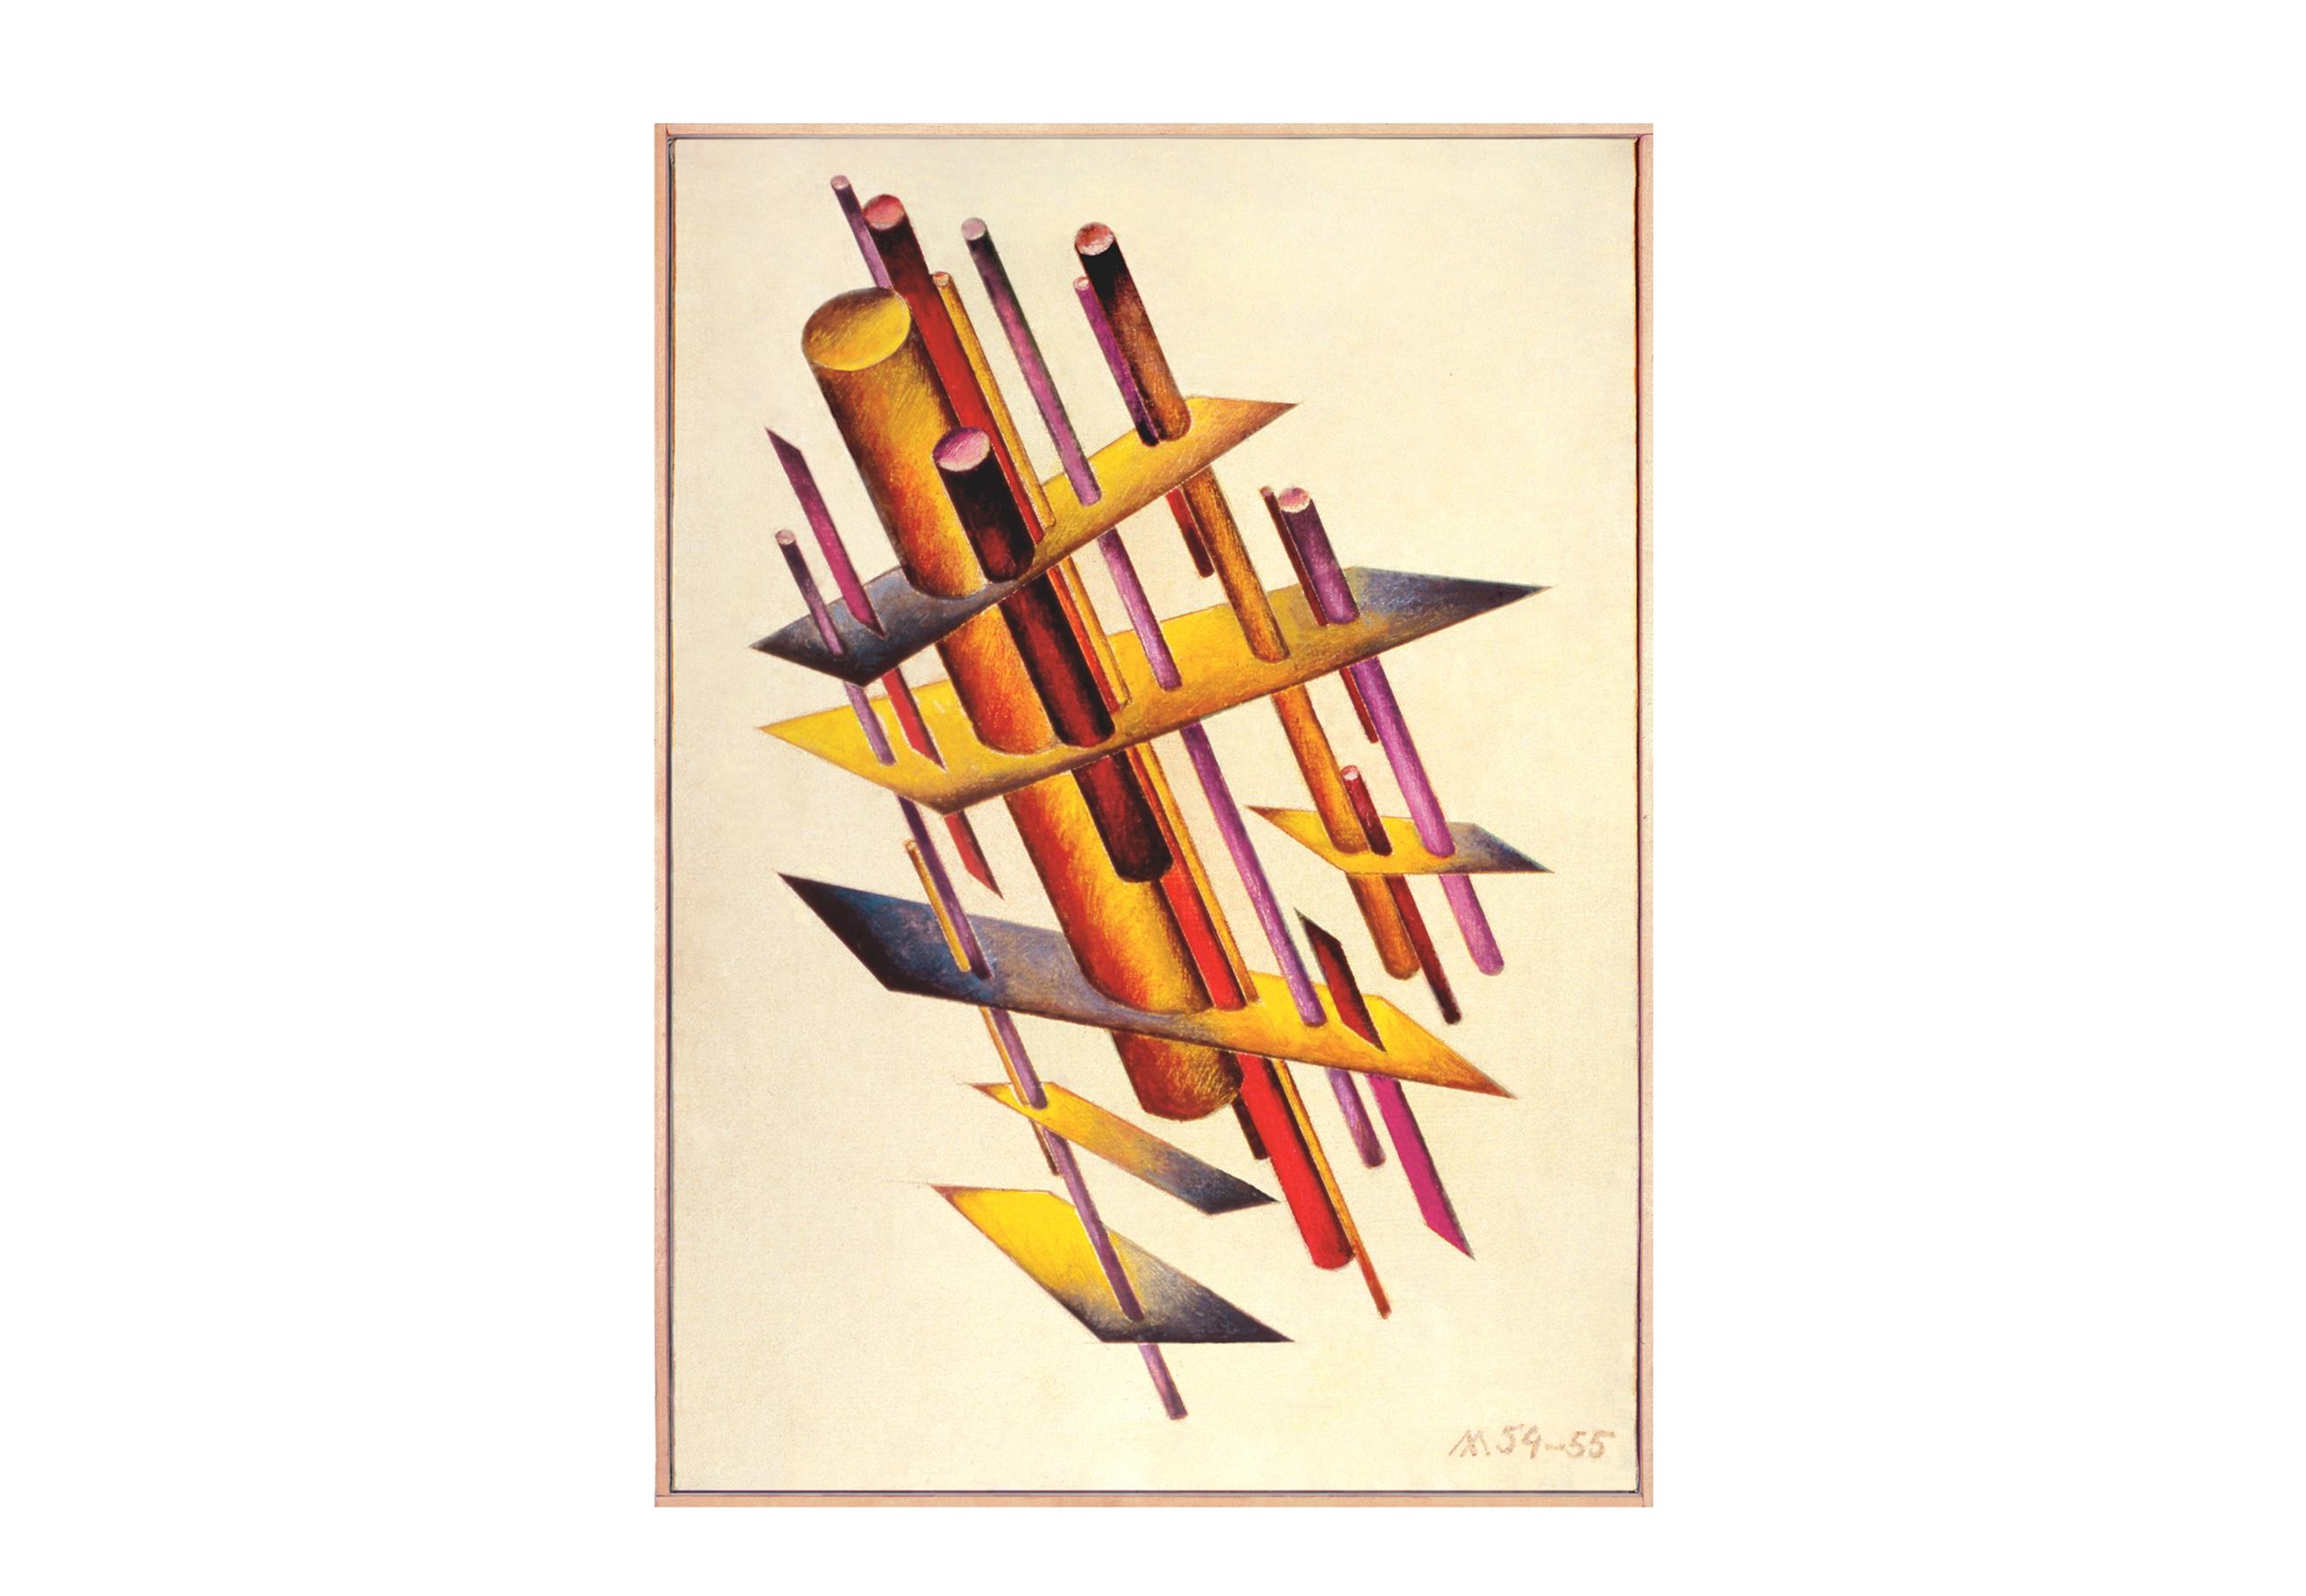 Lamm-Portfolio-1954-1955-20.jpg